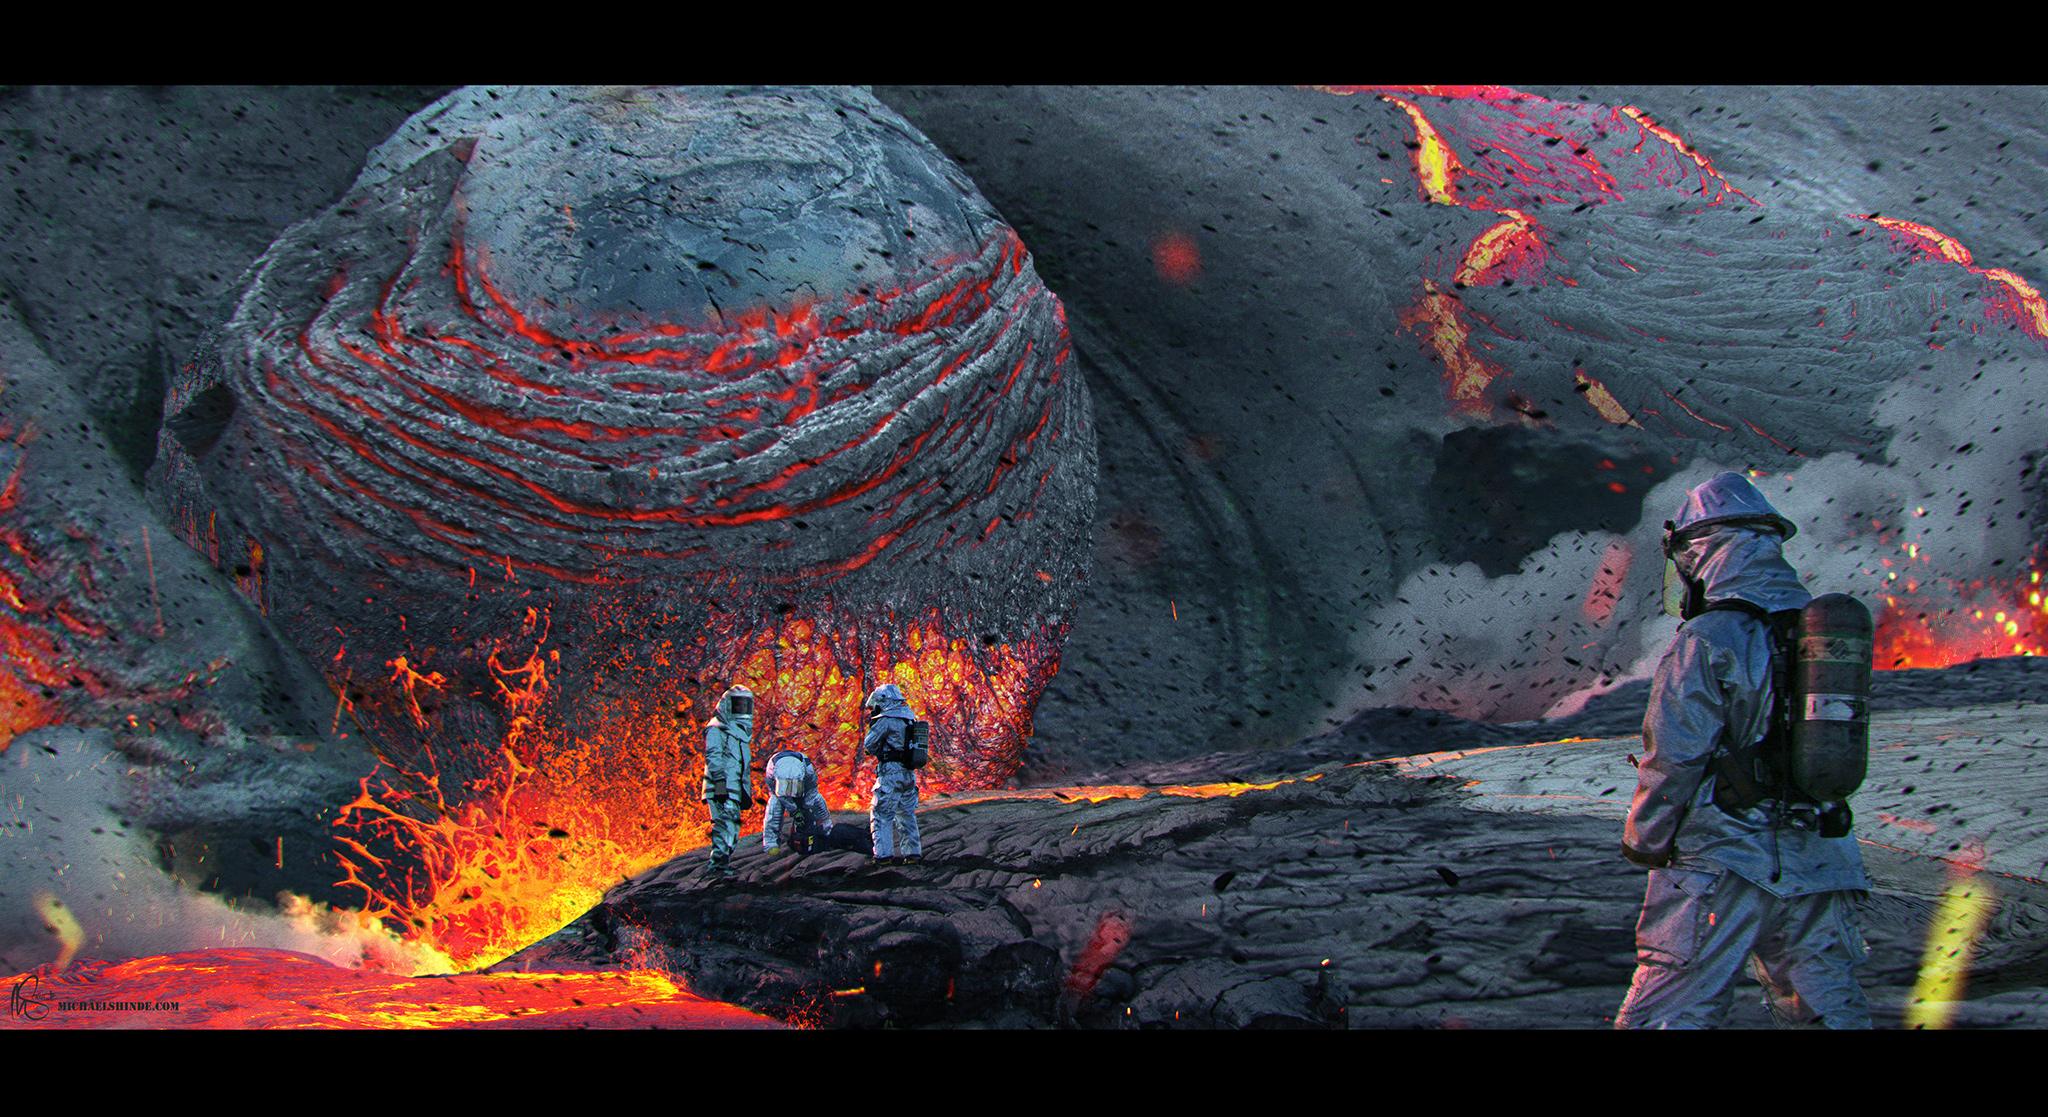 Ball of Lava